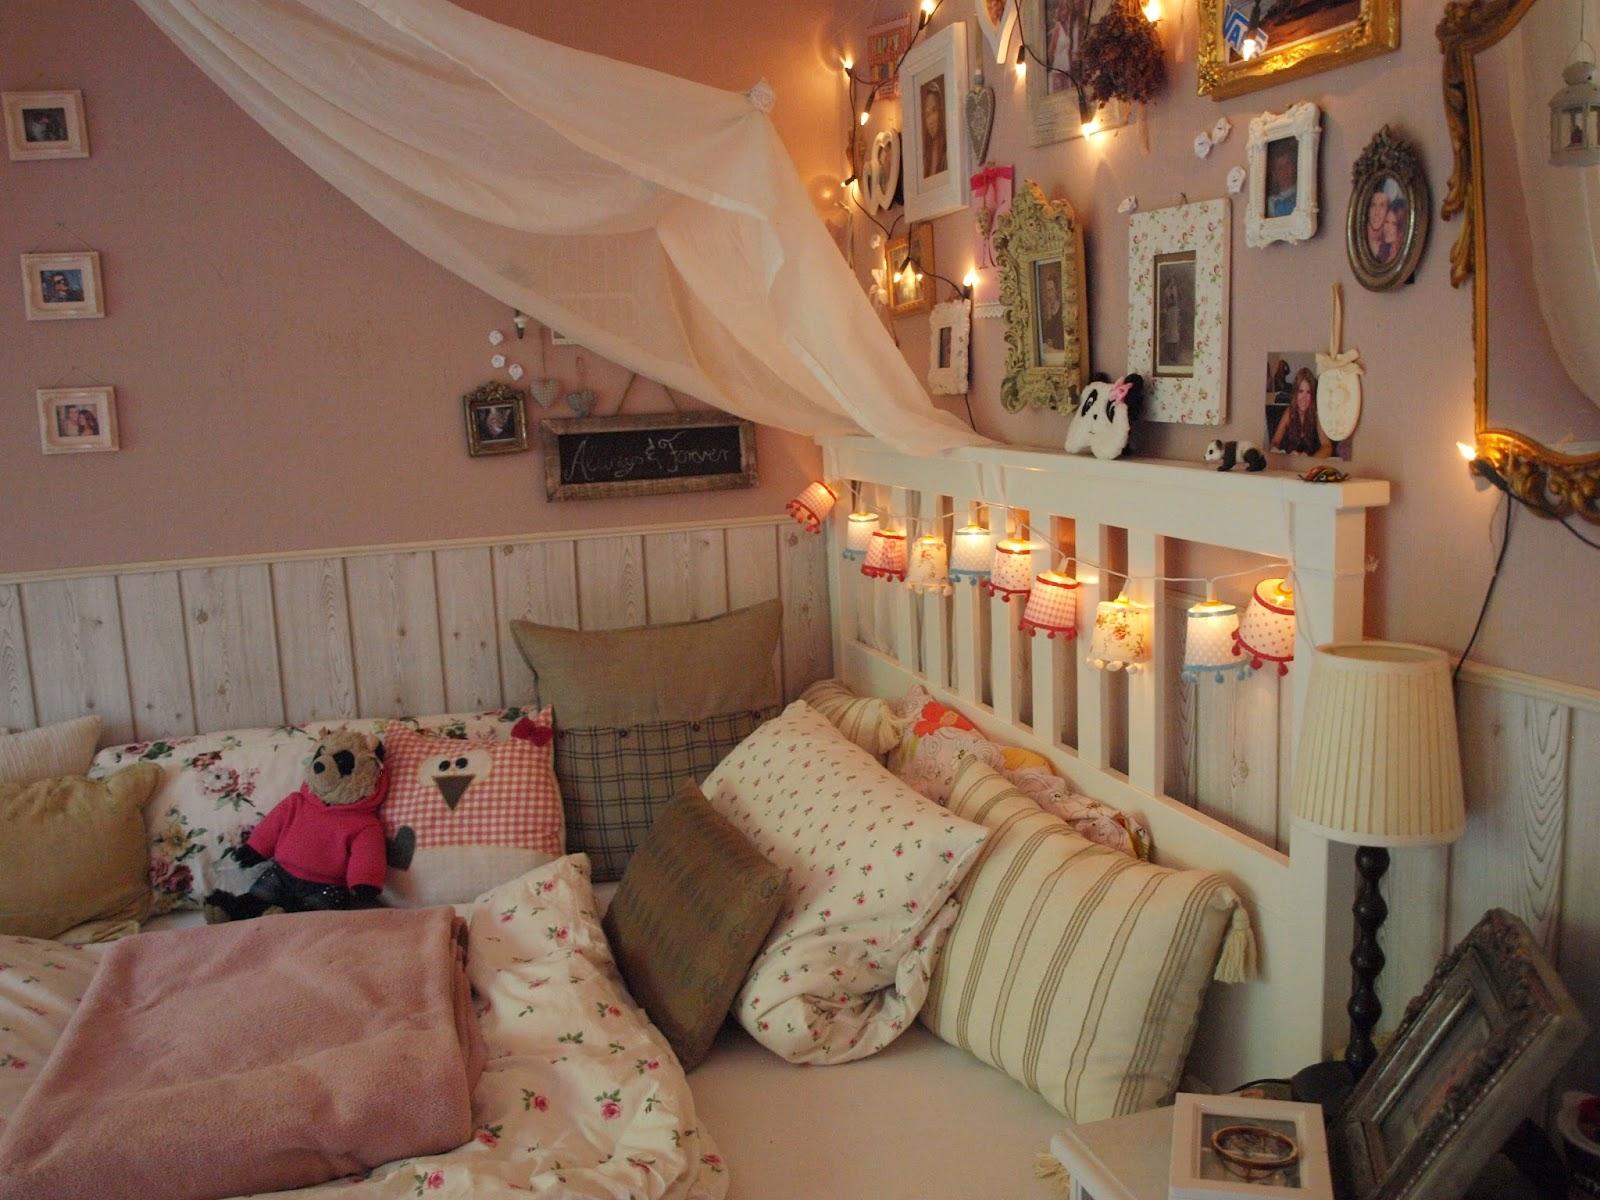 deartally wohnen wie im ikea katalog. Black Bedroom Furniture Sets. Home Design Ideas